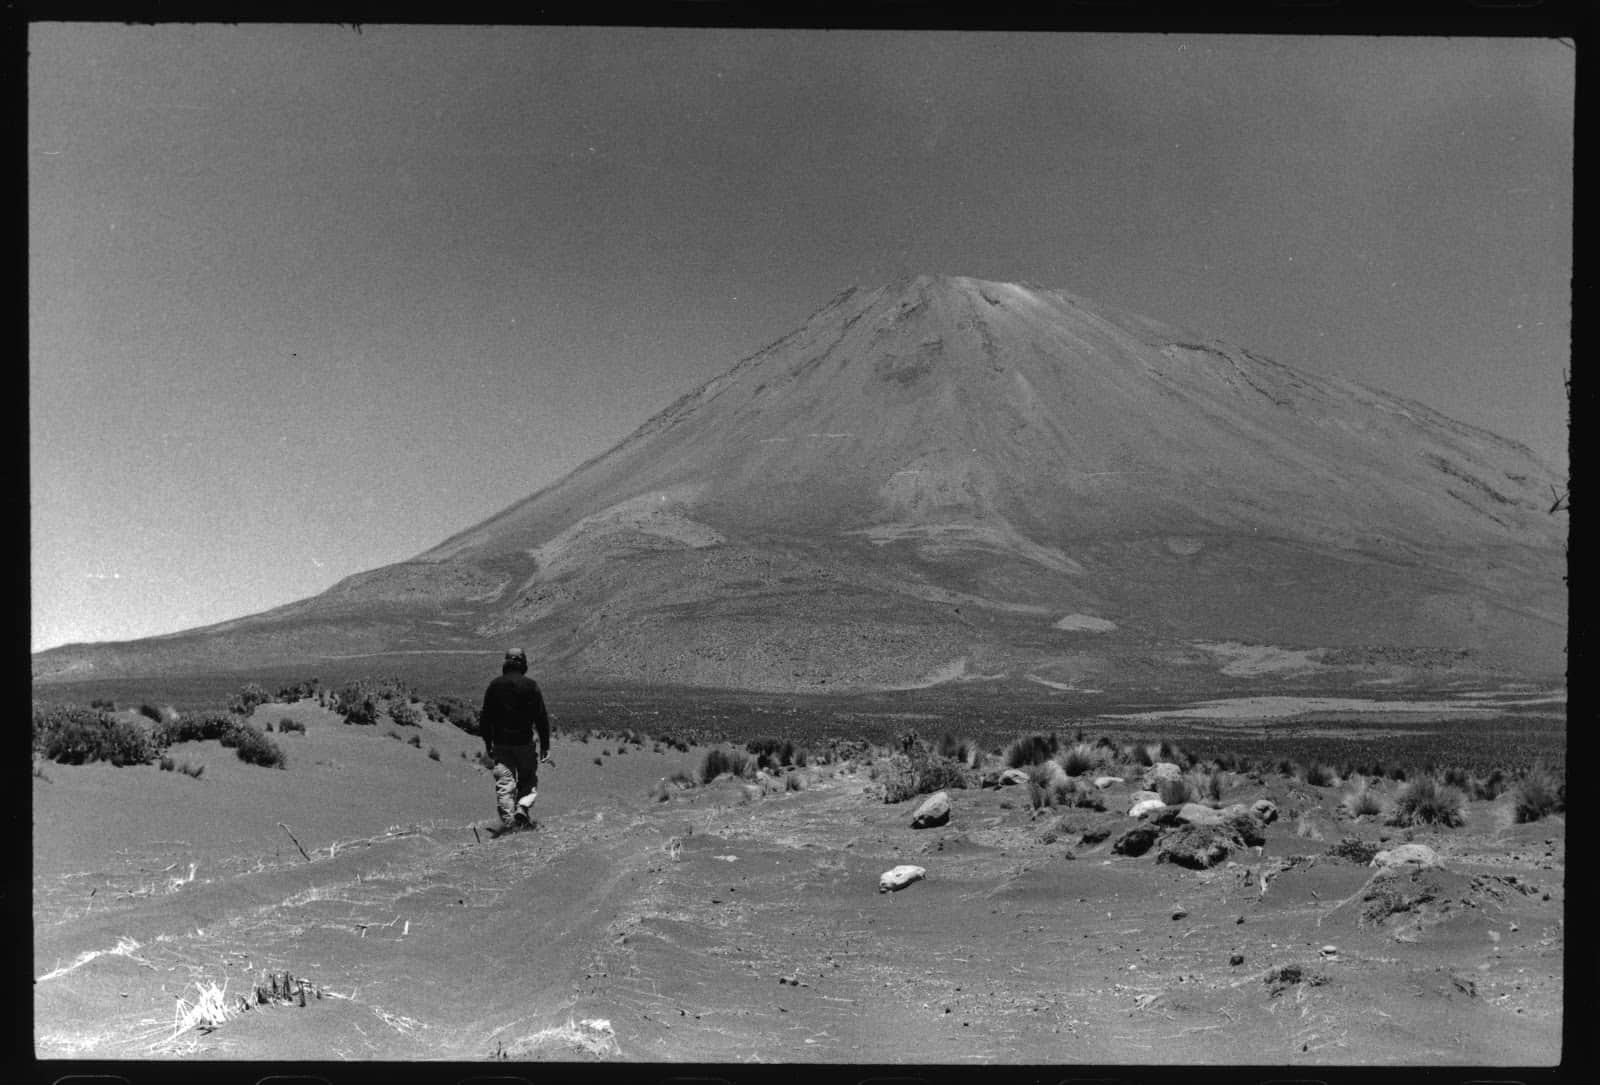 summiting misti the challenges of high altitude hiking: Misti